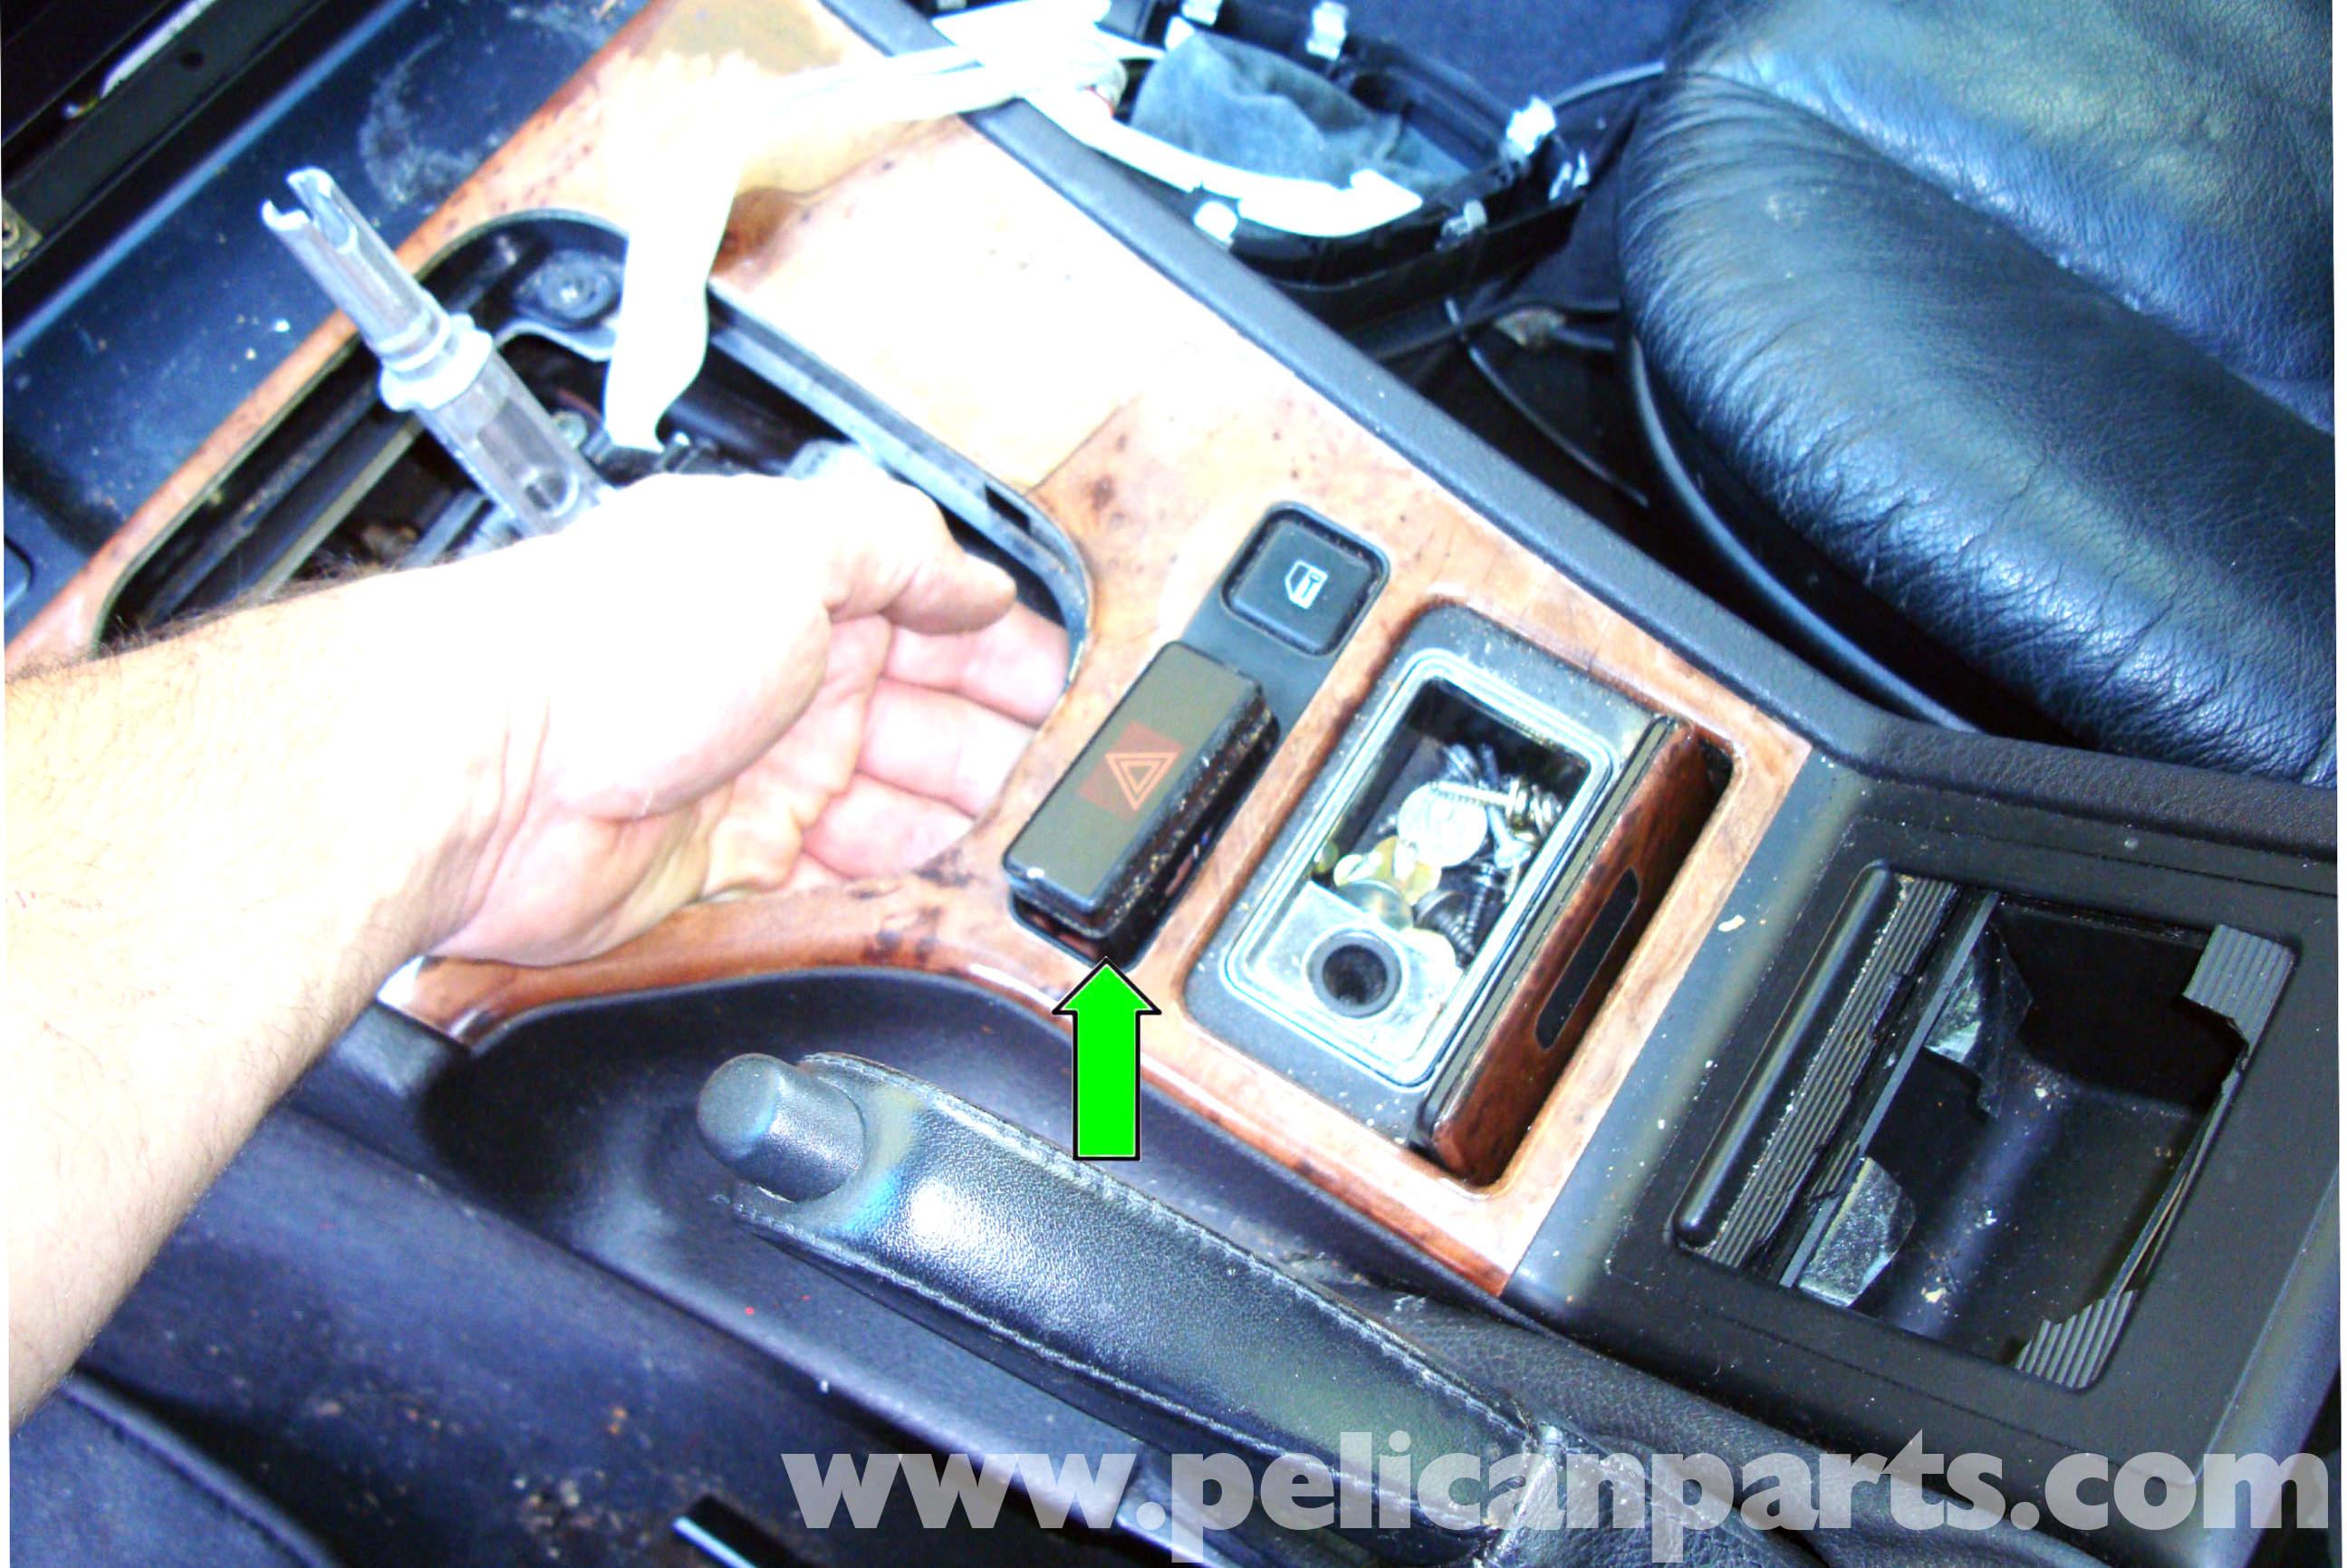 pic05 bmw e39 5 series center console removal 1997 2003 525i, 528i, 530i